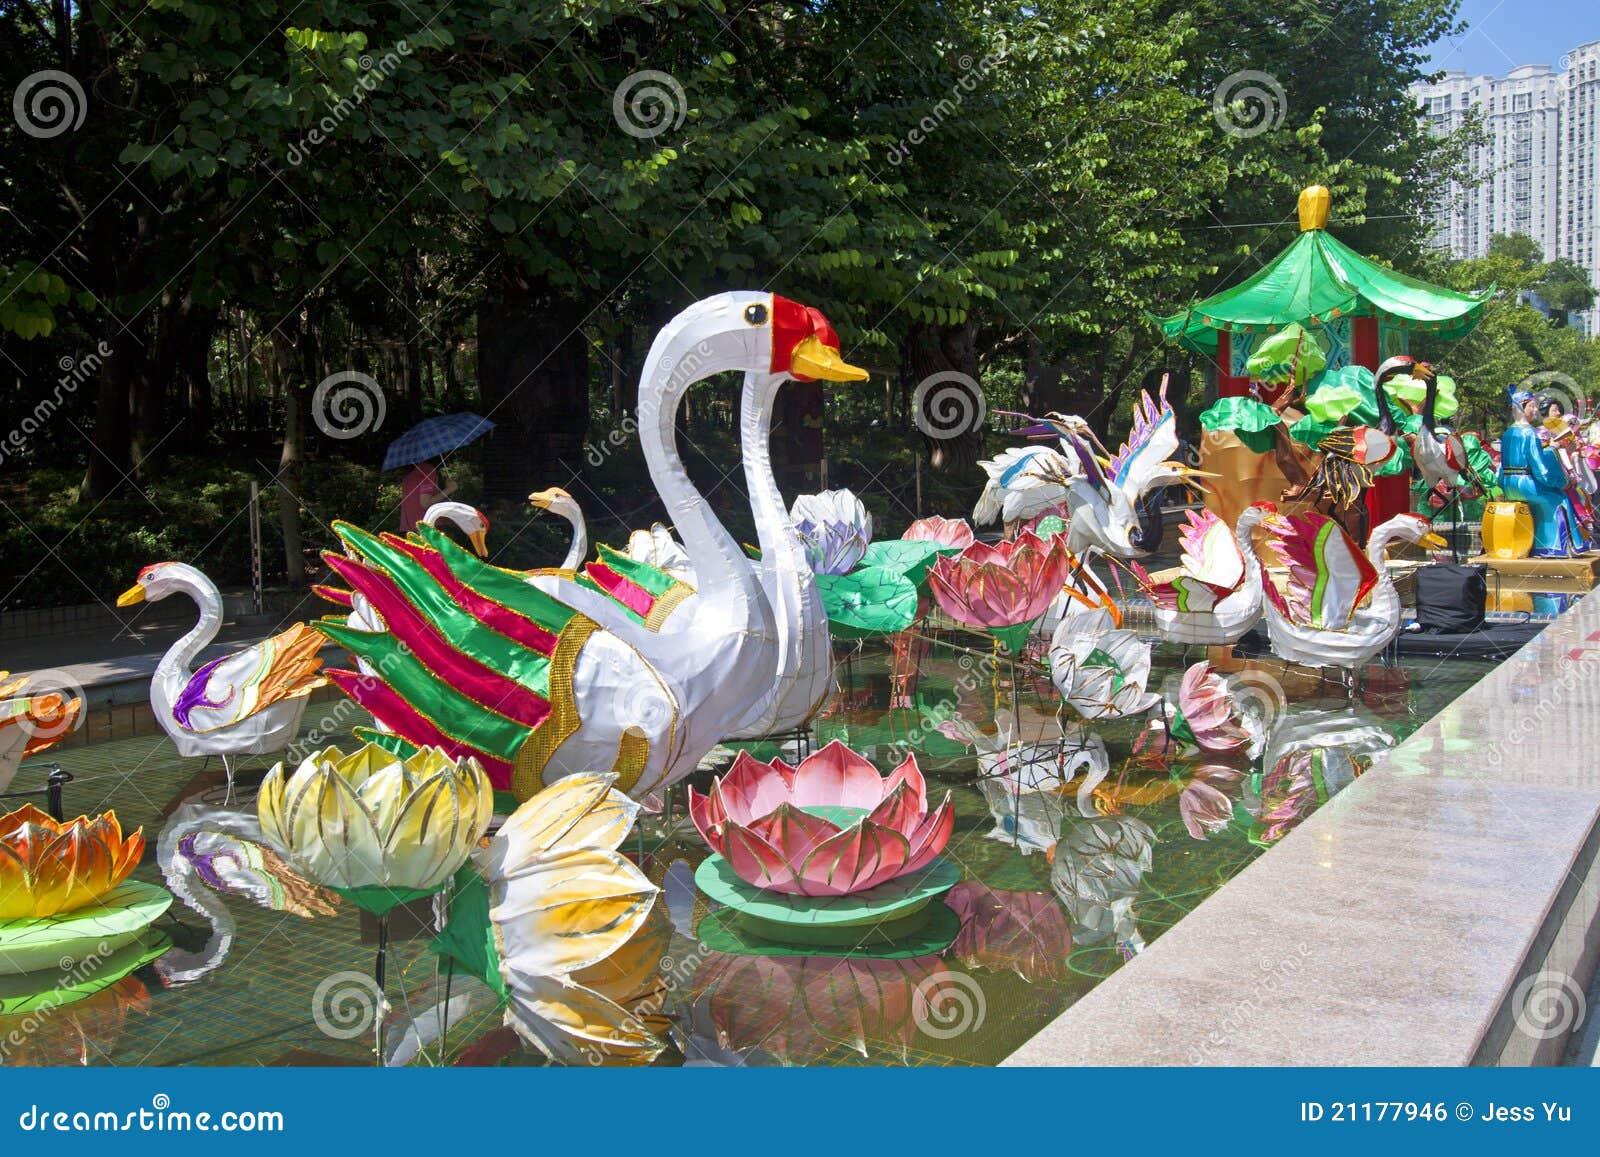 Mid-Autumn Lantern Carnival in Hong Kong